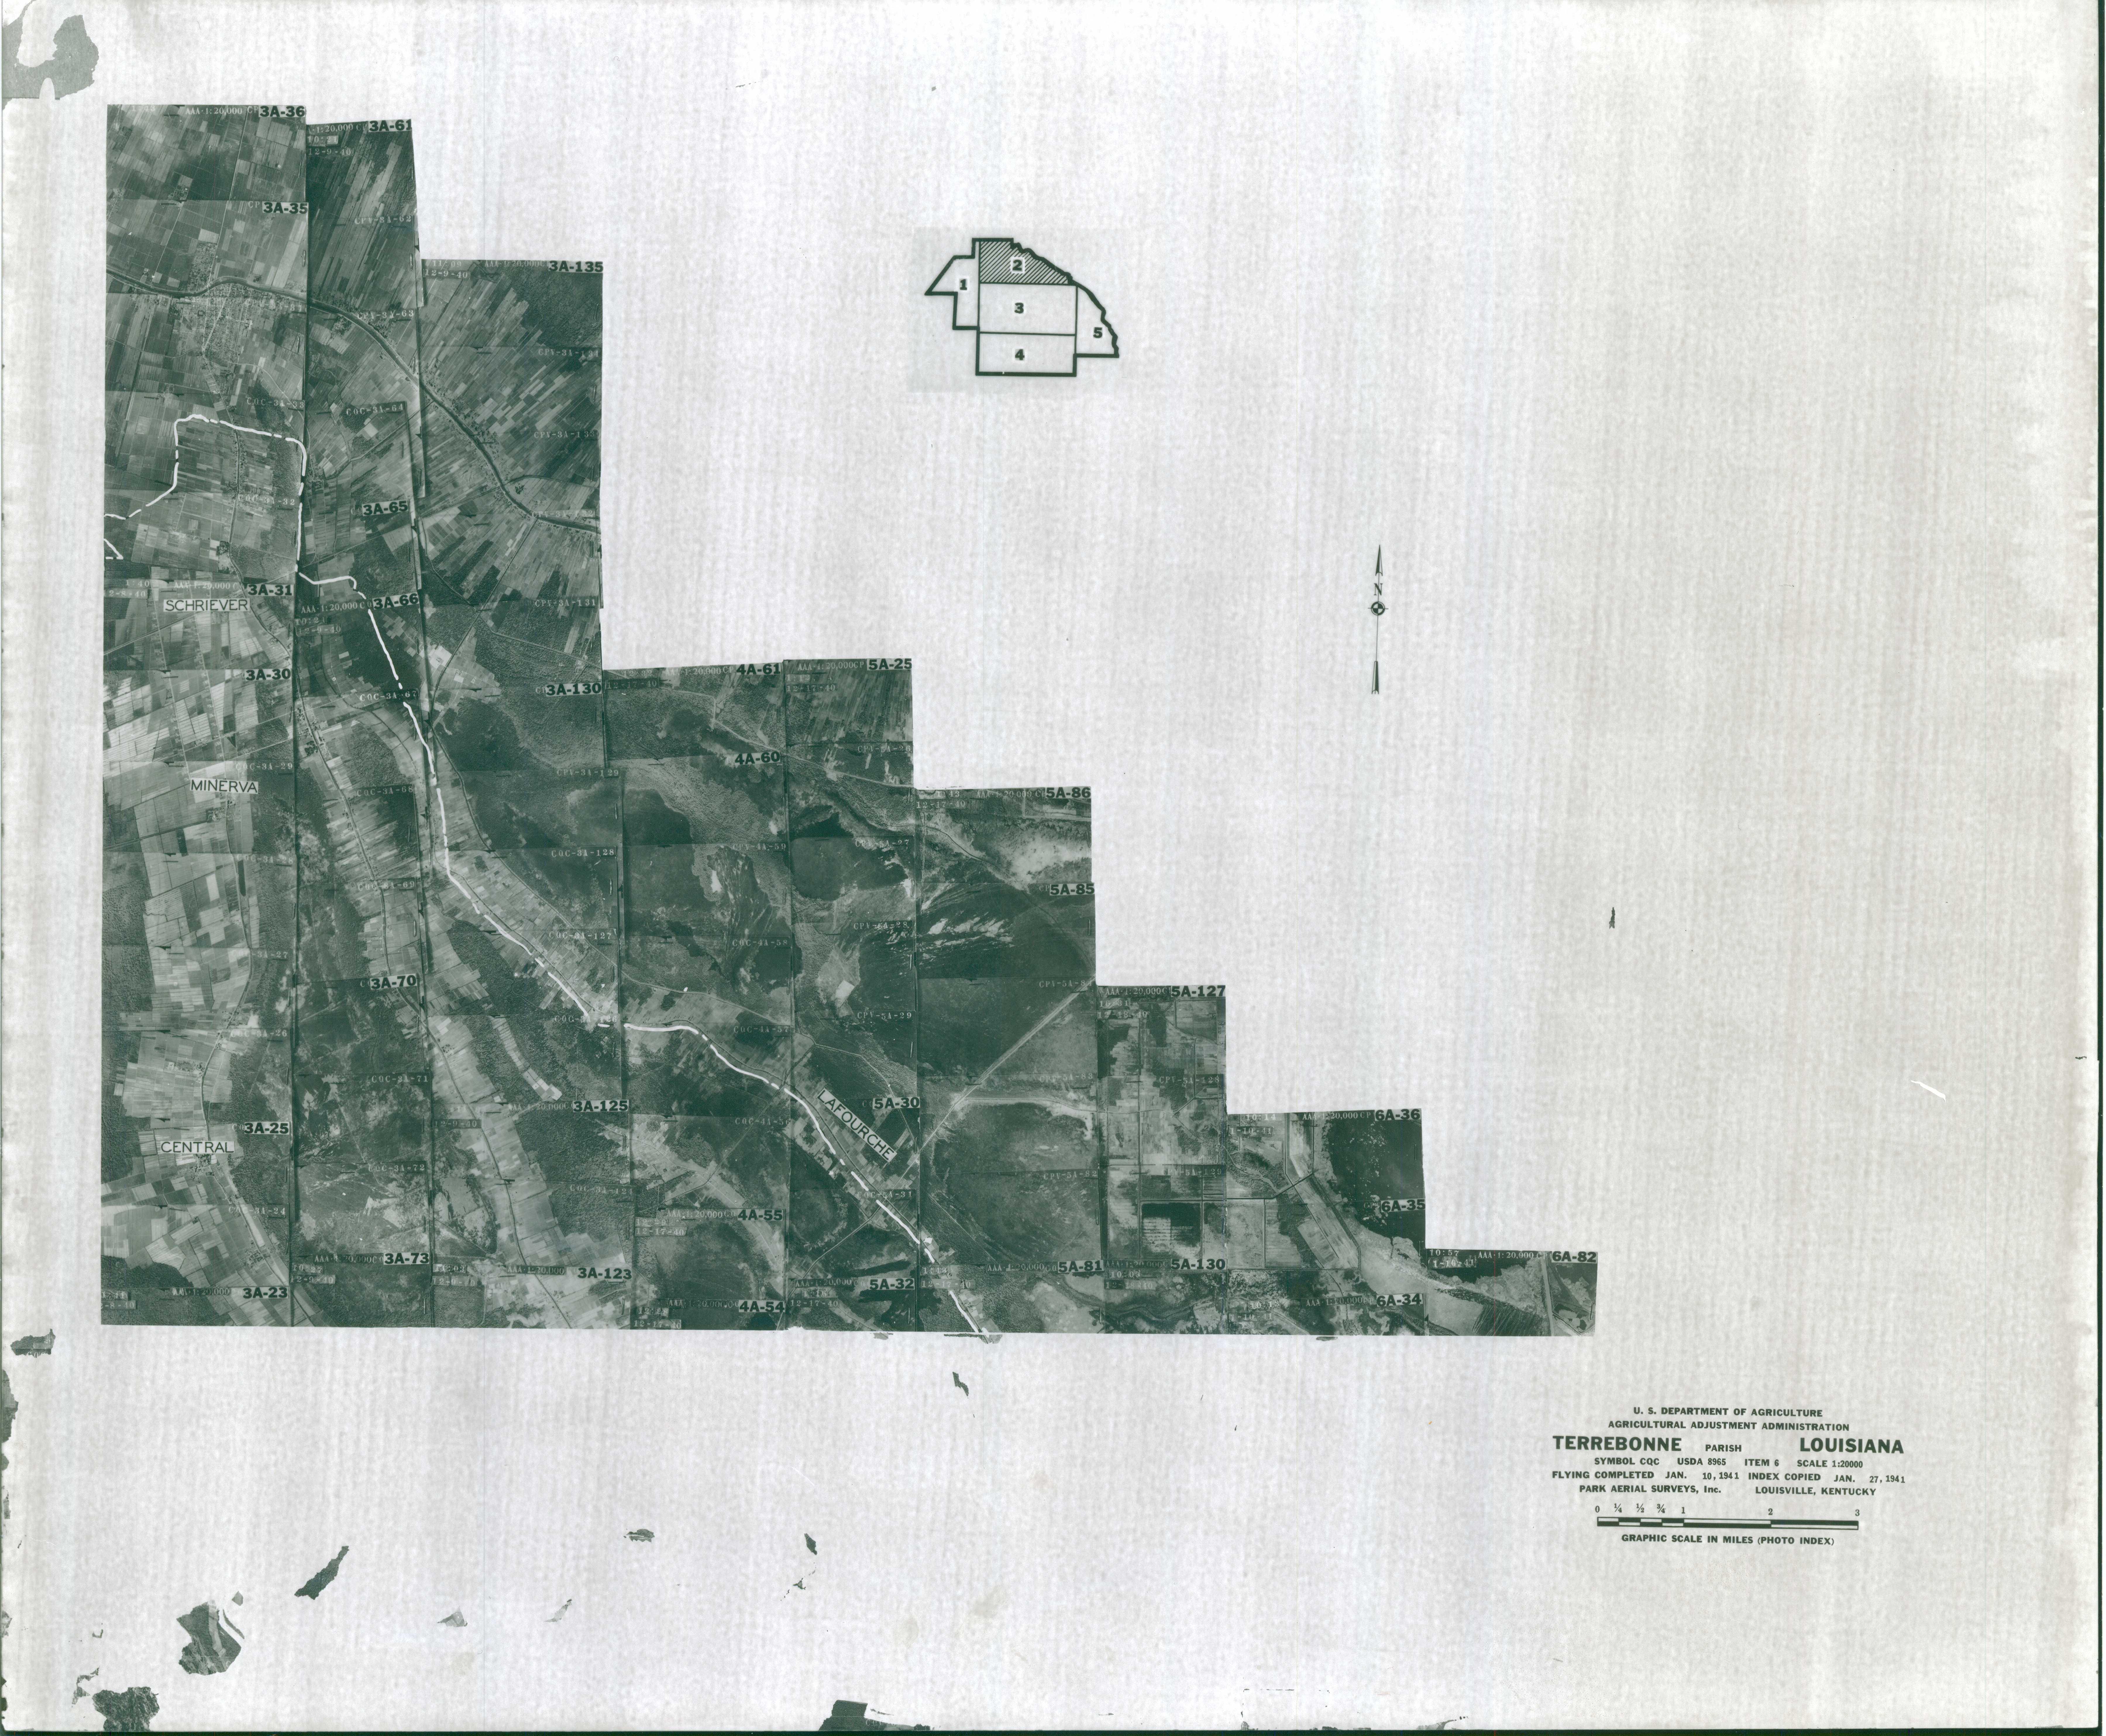 Index to Aerial Photography of Terrebonne Parish, Louisiana 2